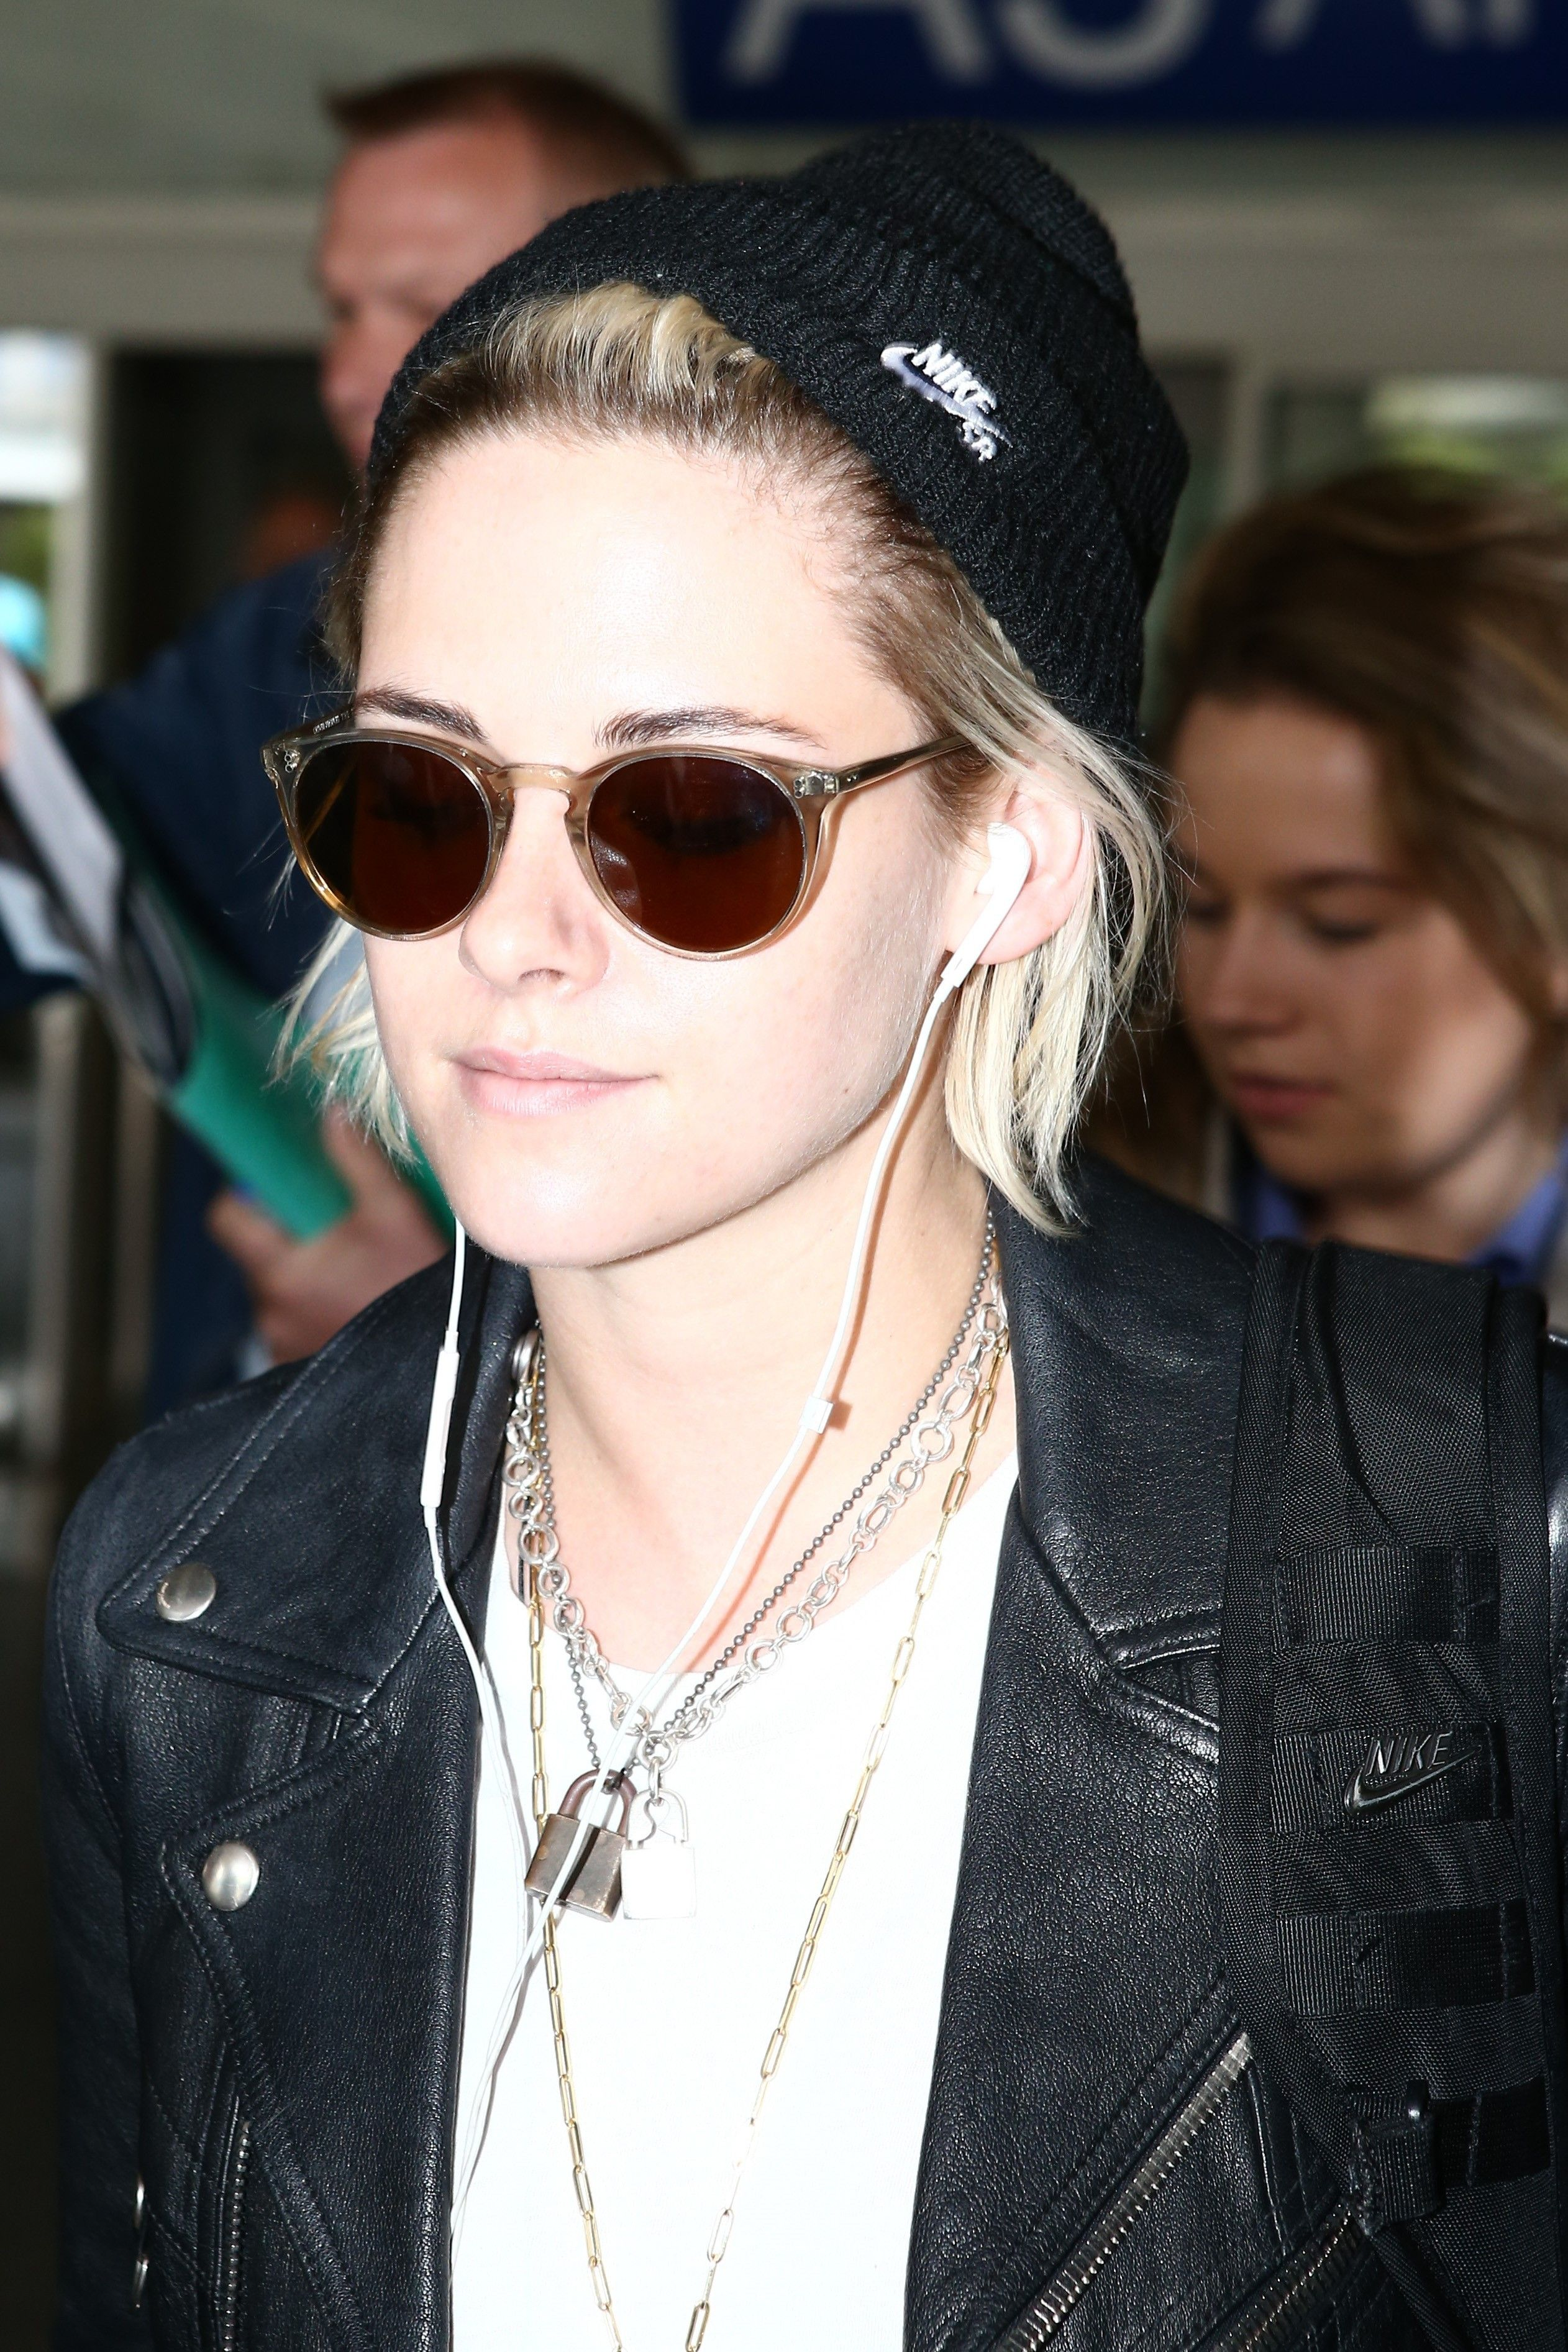 Kristen Stewart Arrives in Nice, France Ahead of Cannes Film Festival - Kristen  Stewart Leather (wearing O Malley NYC sunglasses) d188eb8640ee